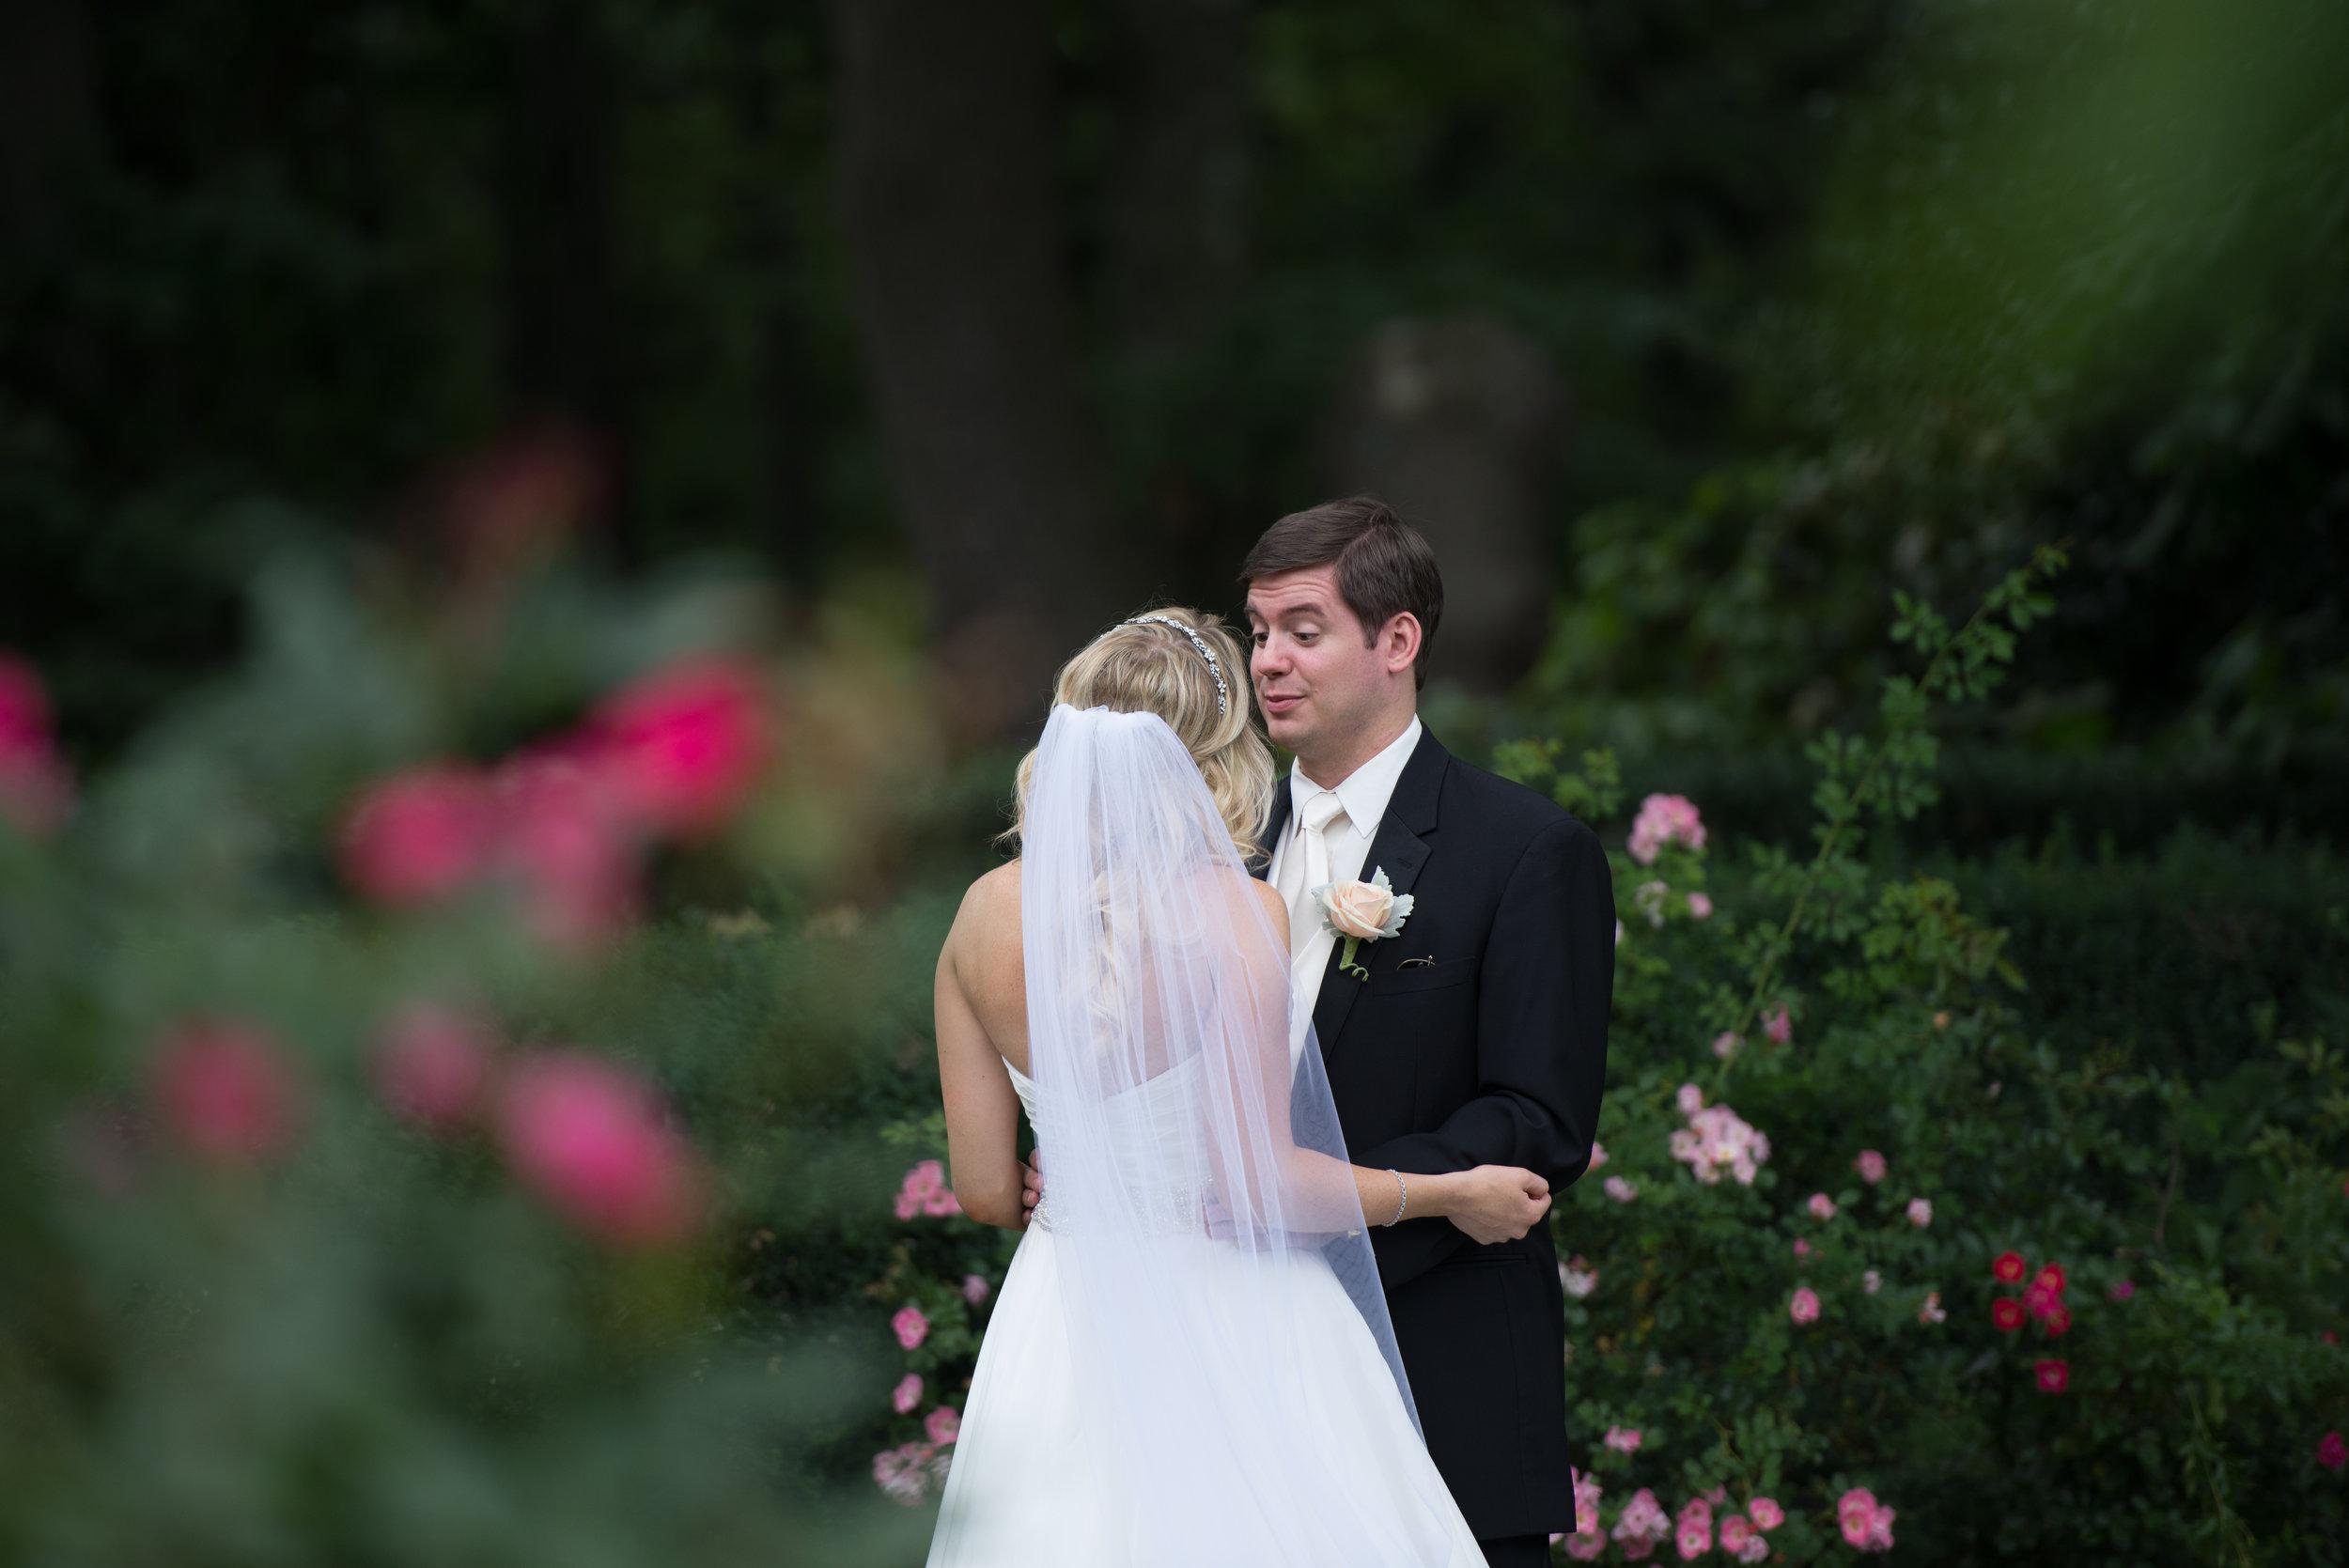 Wedding First Look Photos00944.jpg